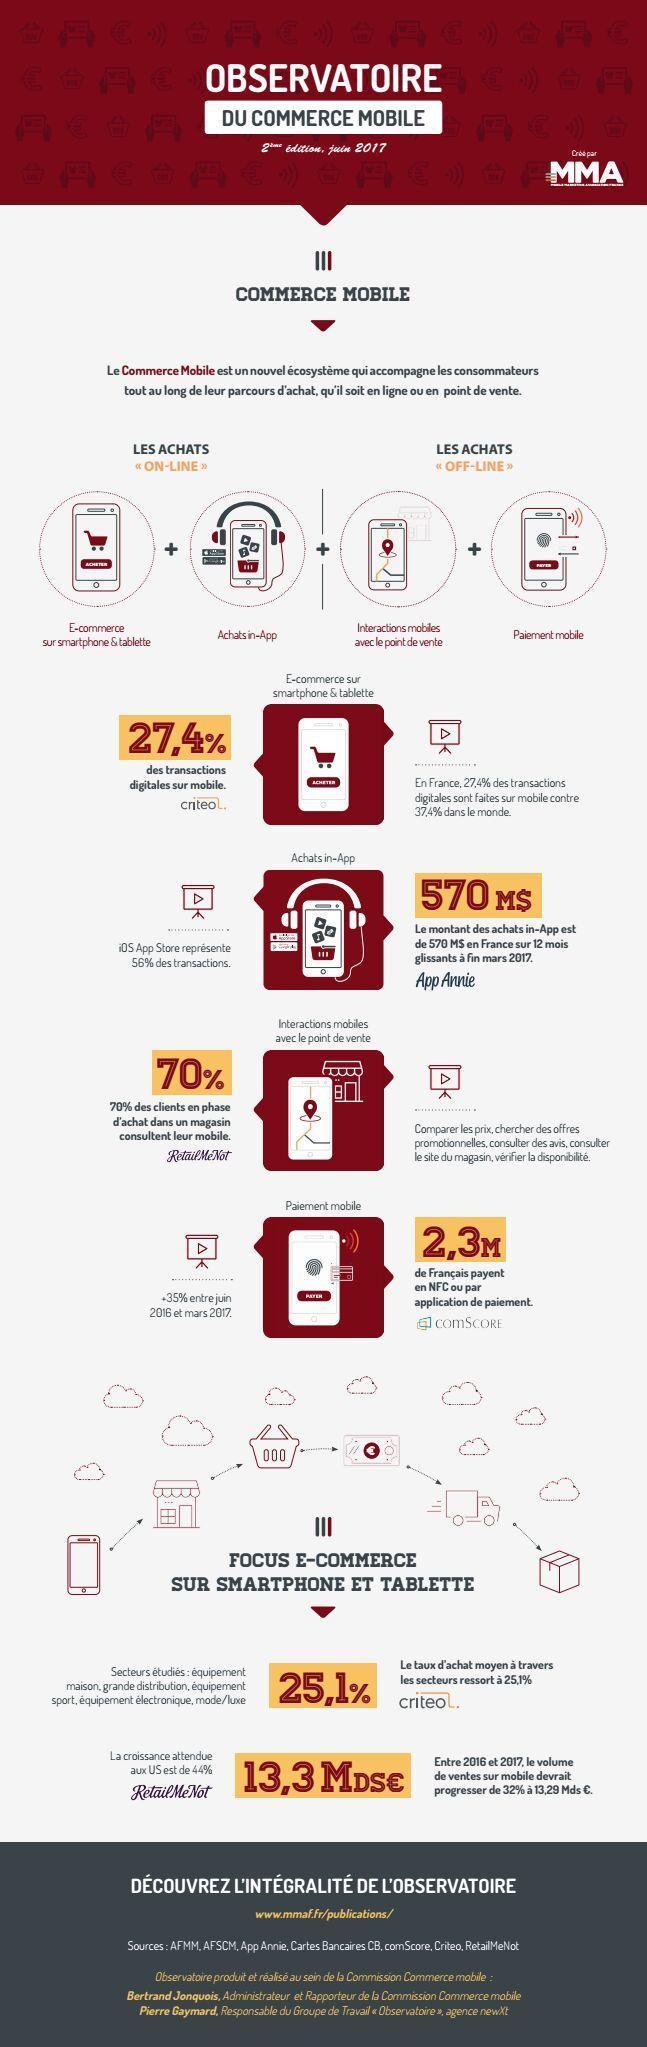 Infographie-Observatoire-Commerce-mobile-juin-2017-1